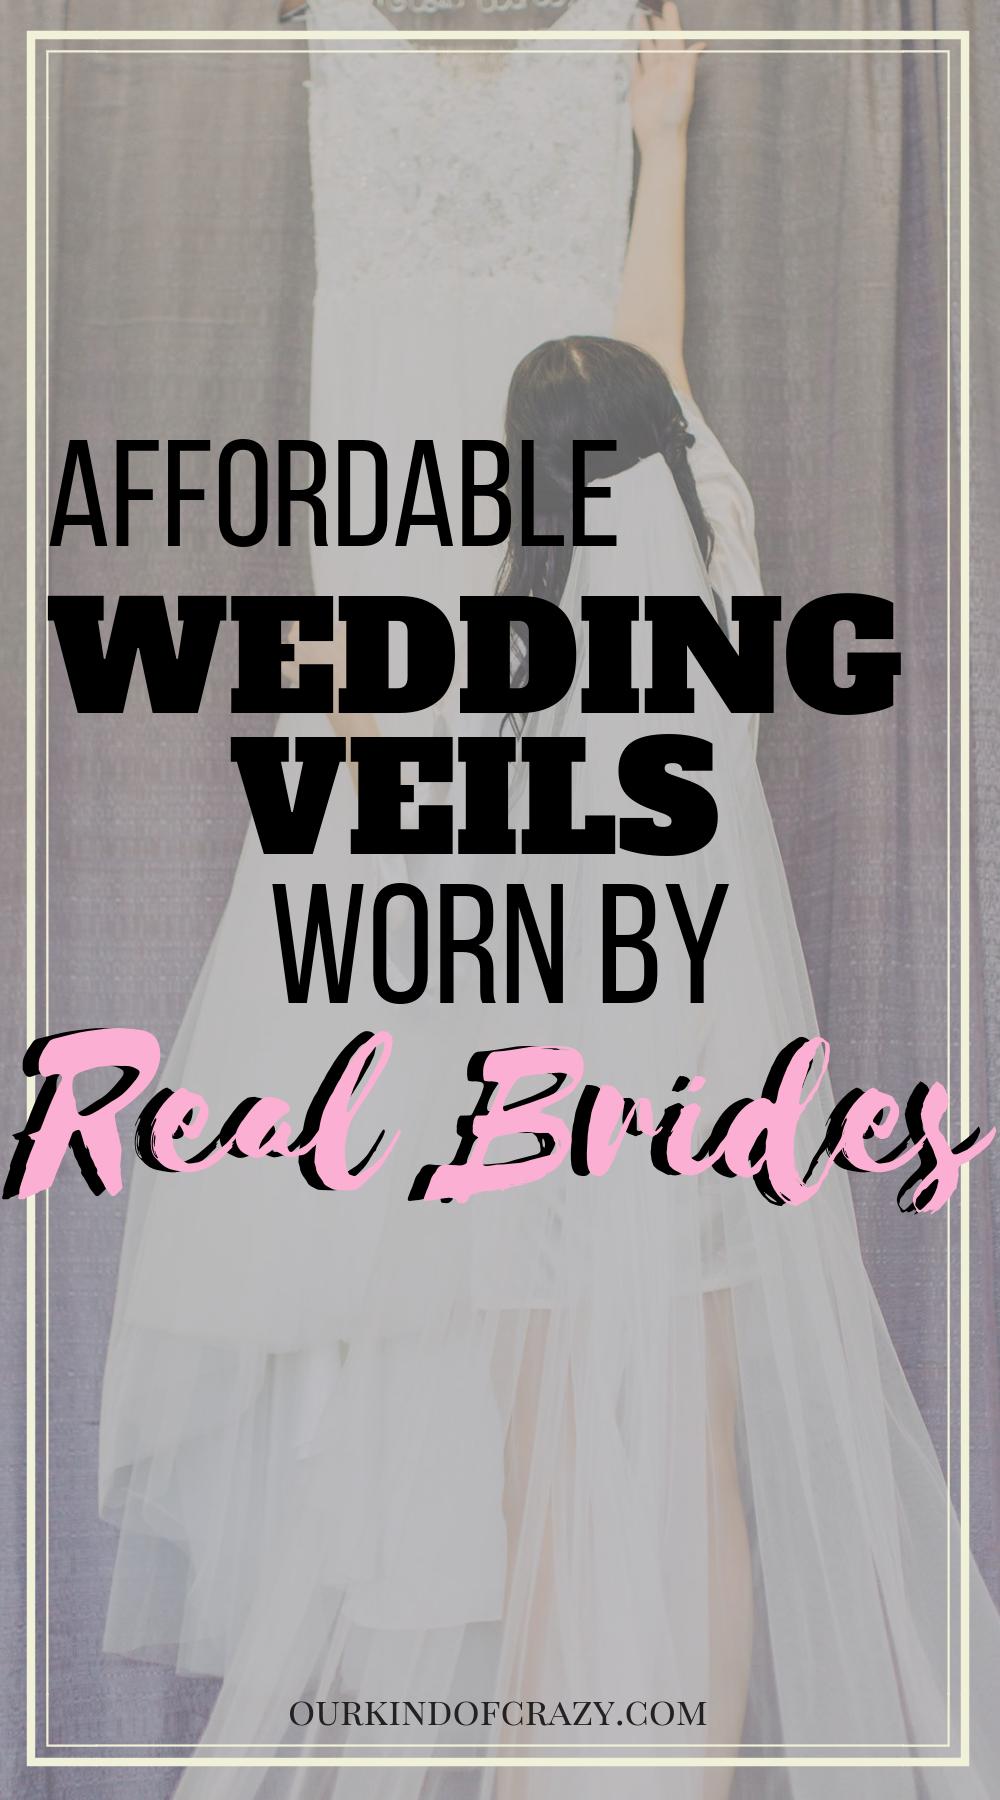 Best Wedding Veils From Amazon-Cheap wedding veils